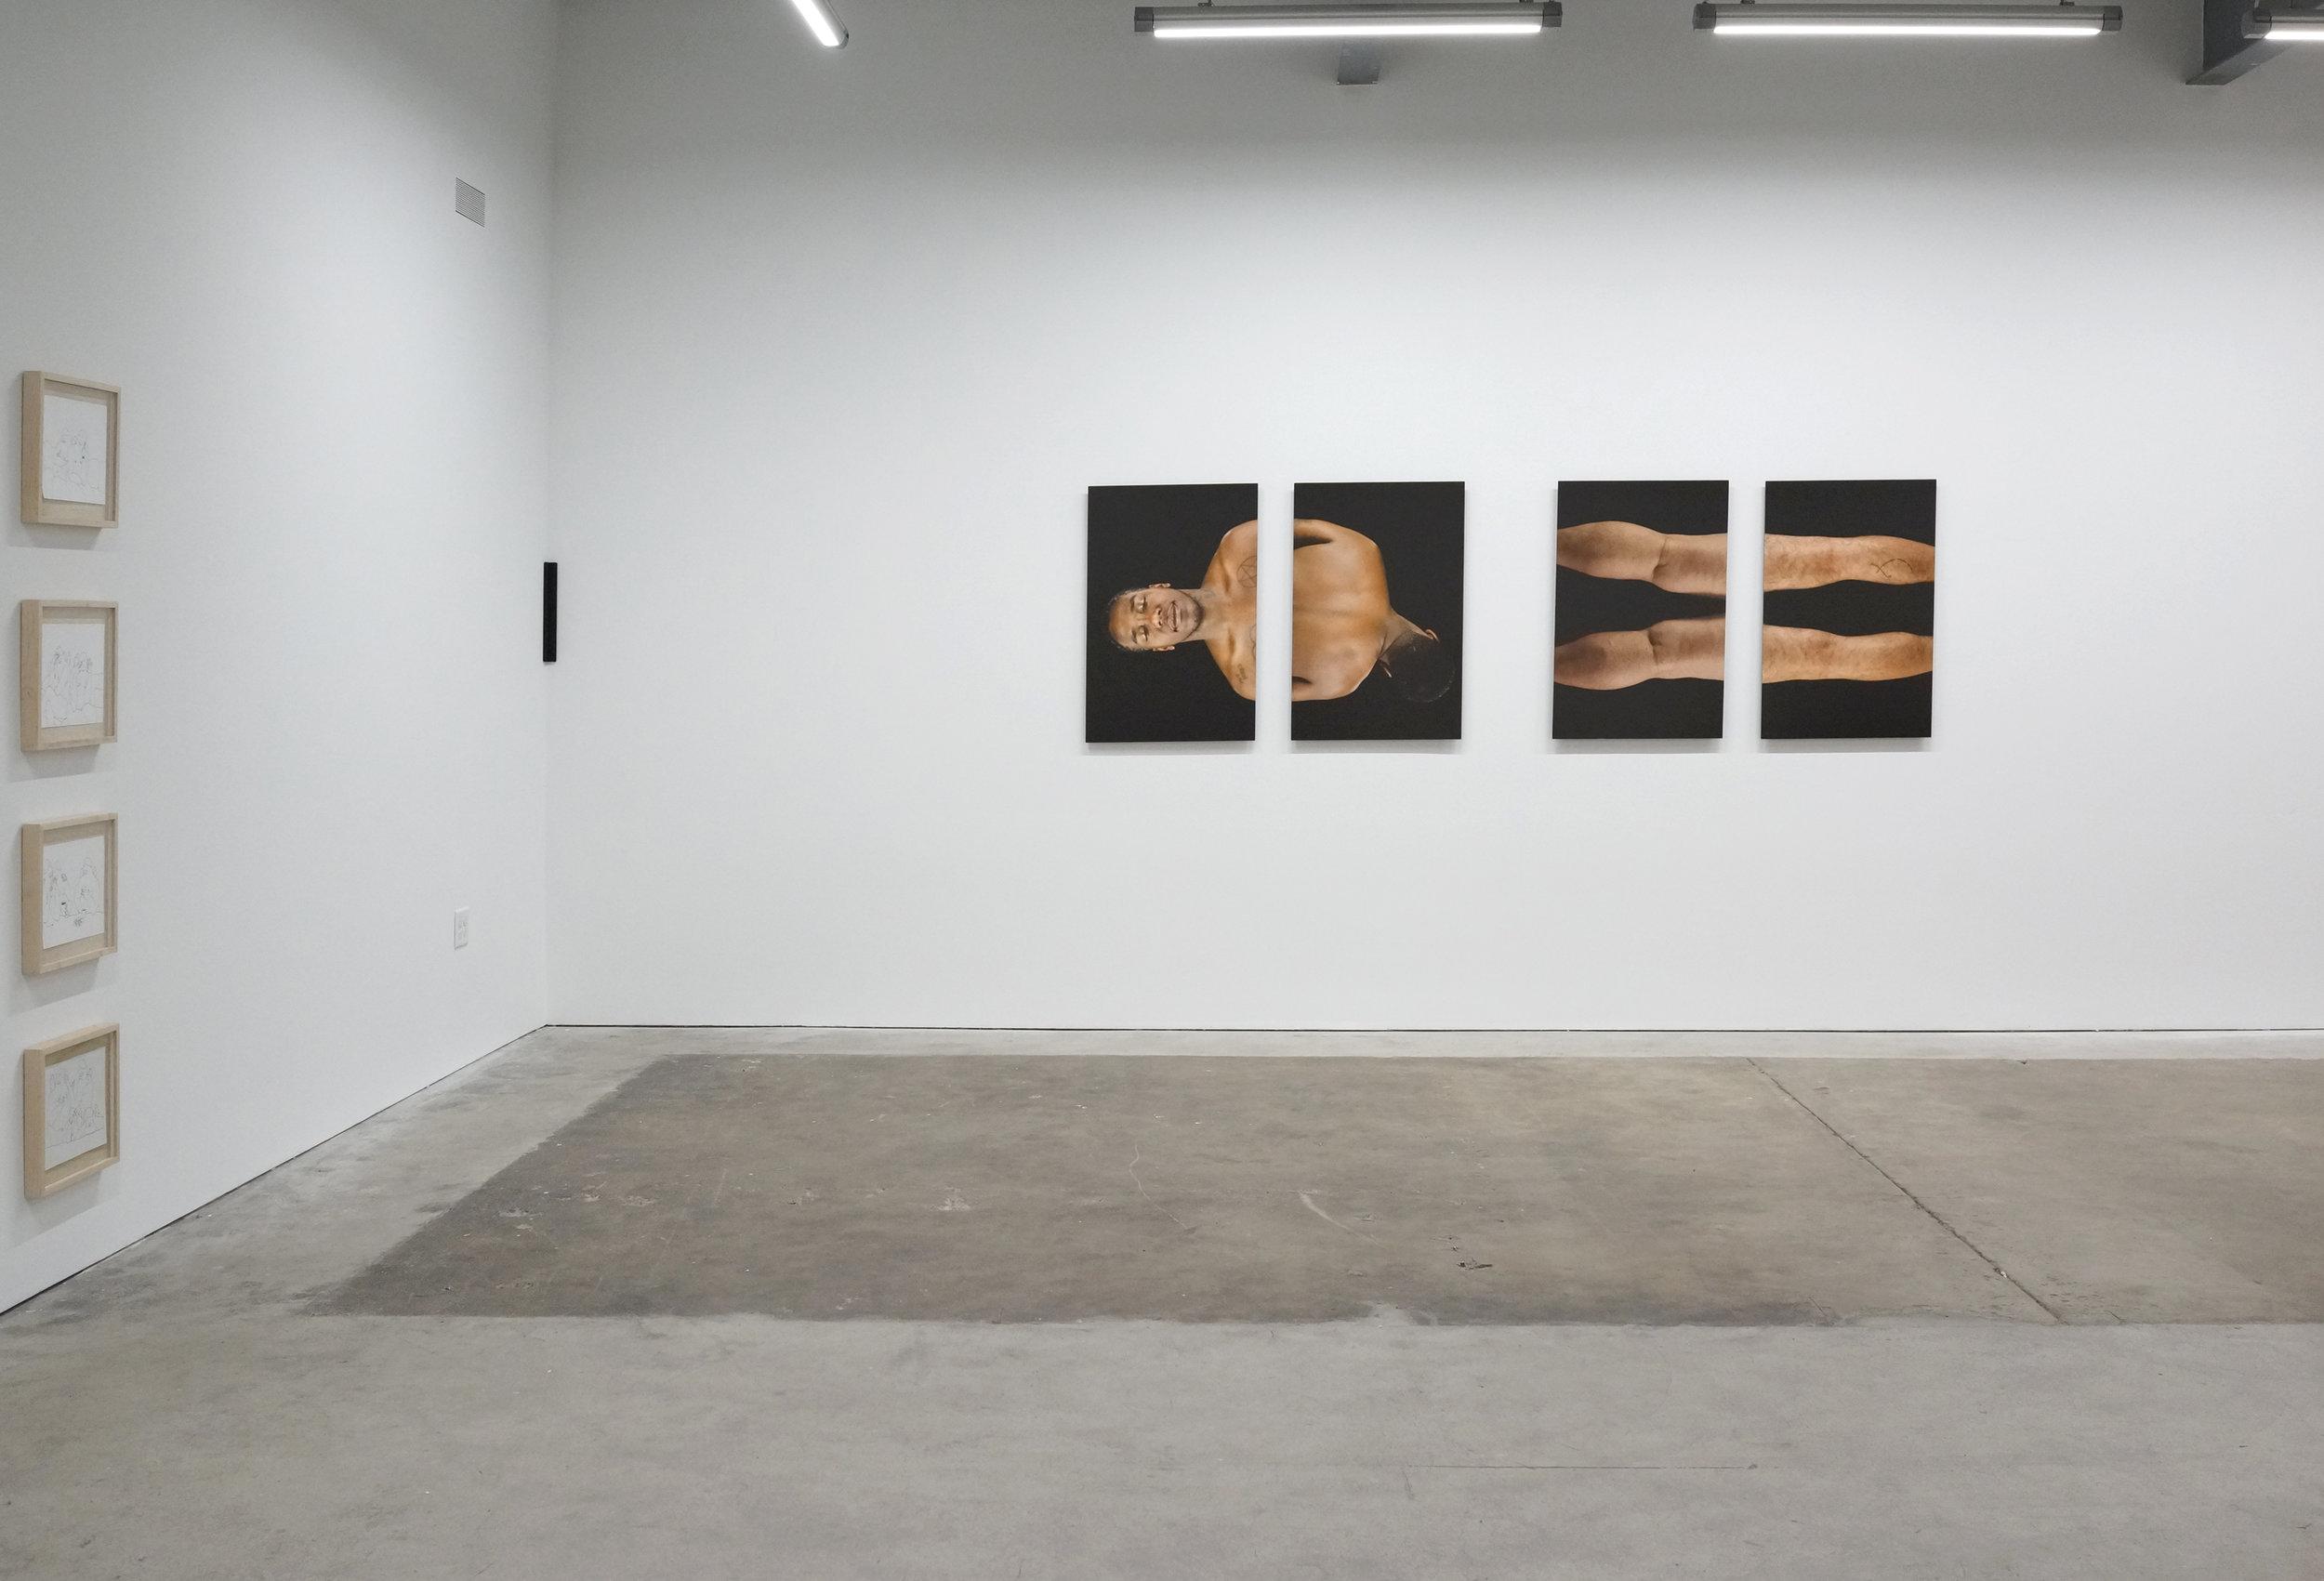 Installation view, L — Craig Calderwood, corner — Gregory Kaplowitz, R — Evie Leder